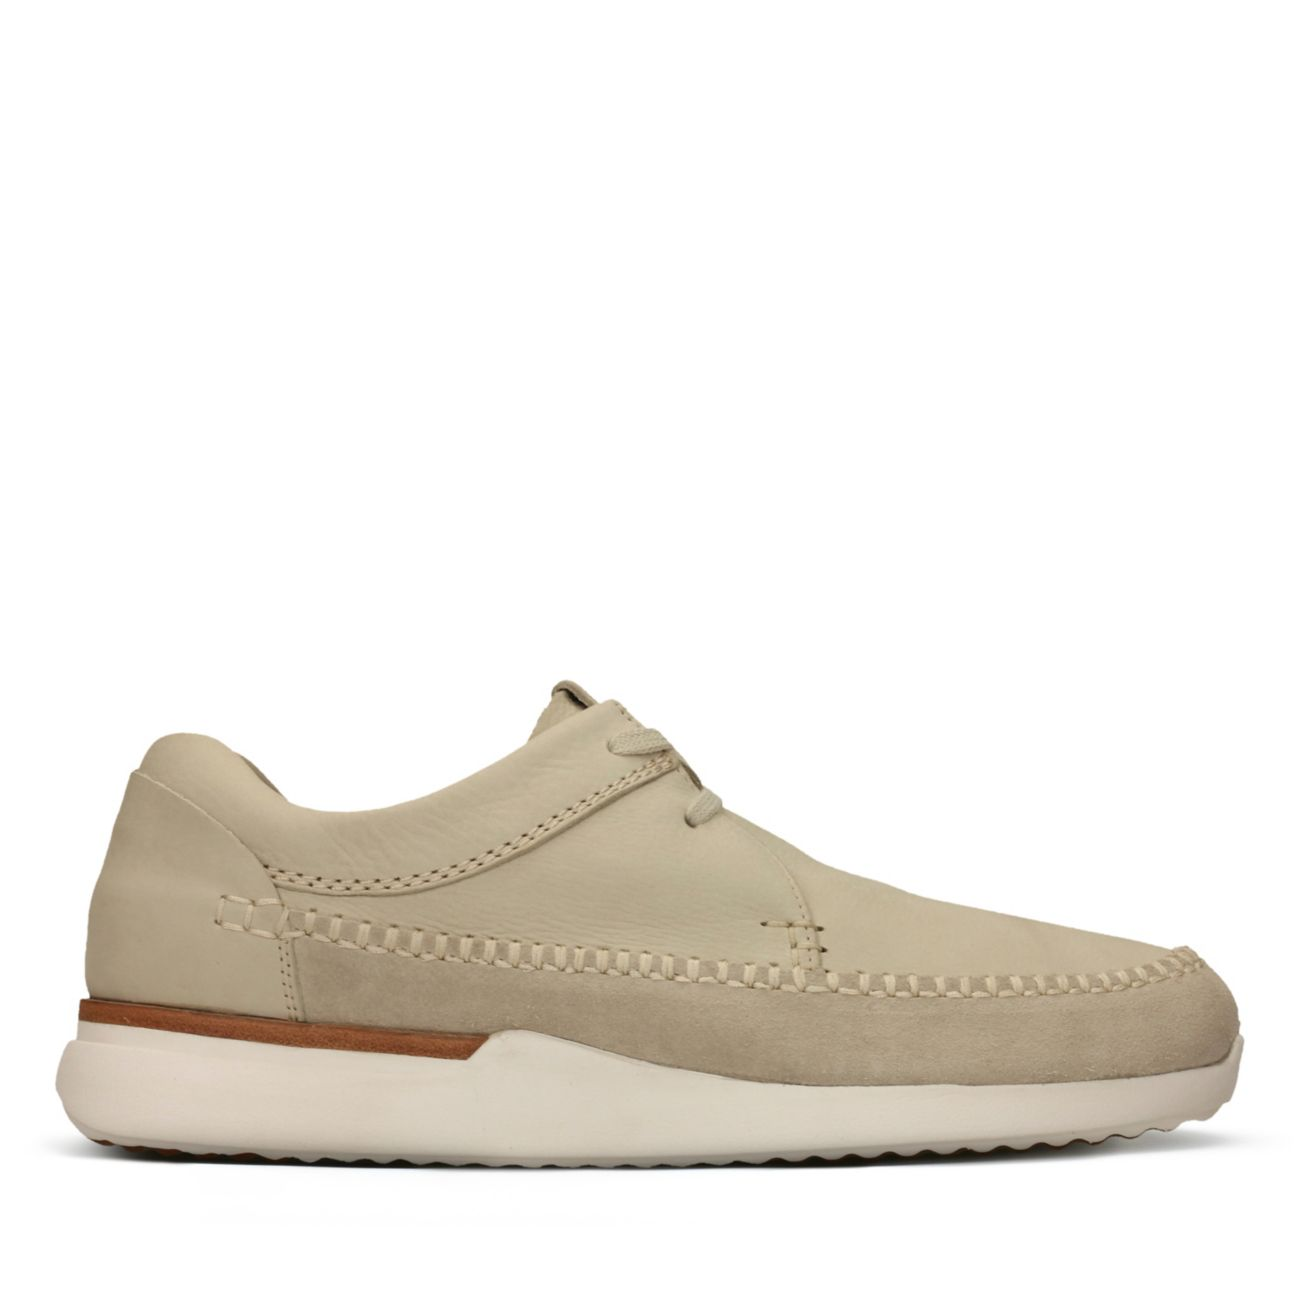 53fb6d8e423a63 Tor Track Off White Nubuck - Clarks Original Shoes - Clarks® Shoes Official  Site   Clarks